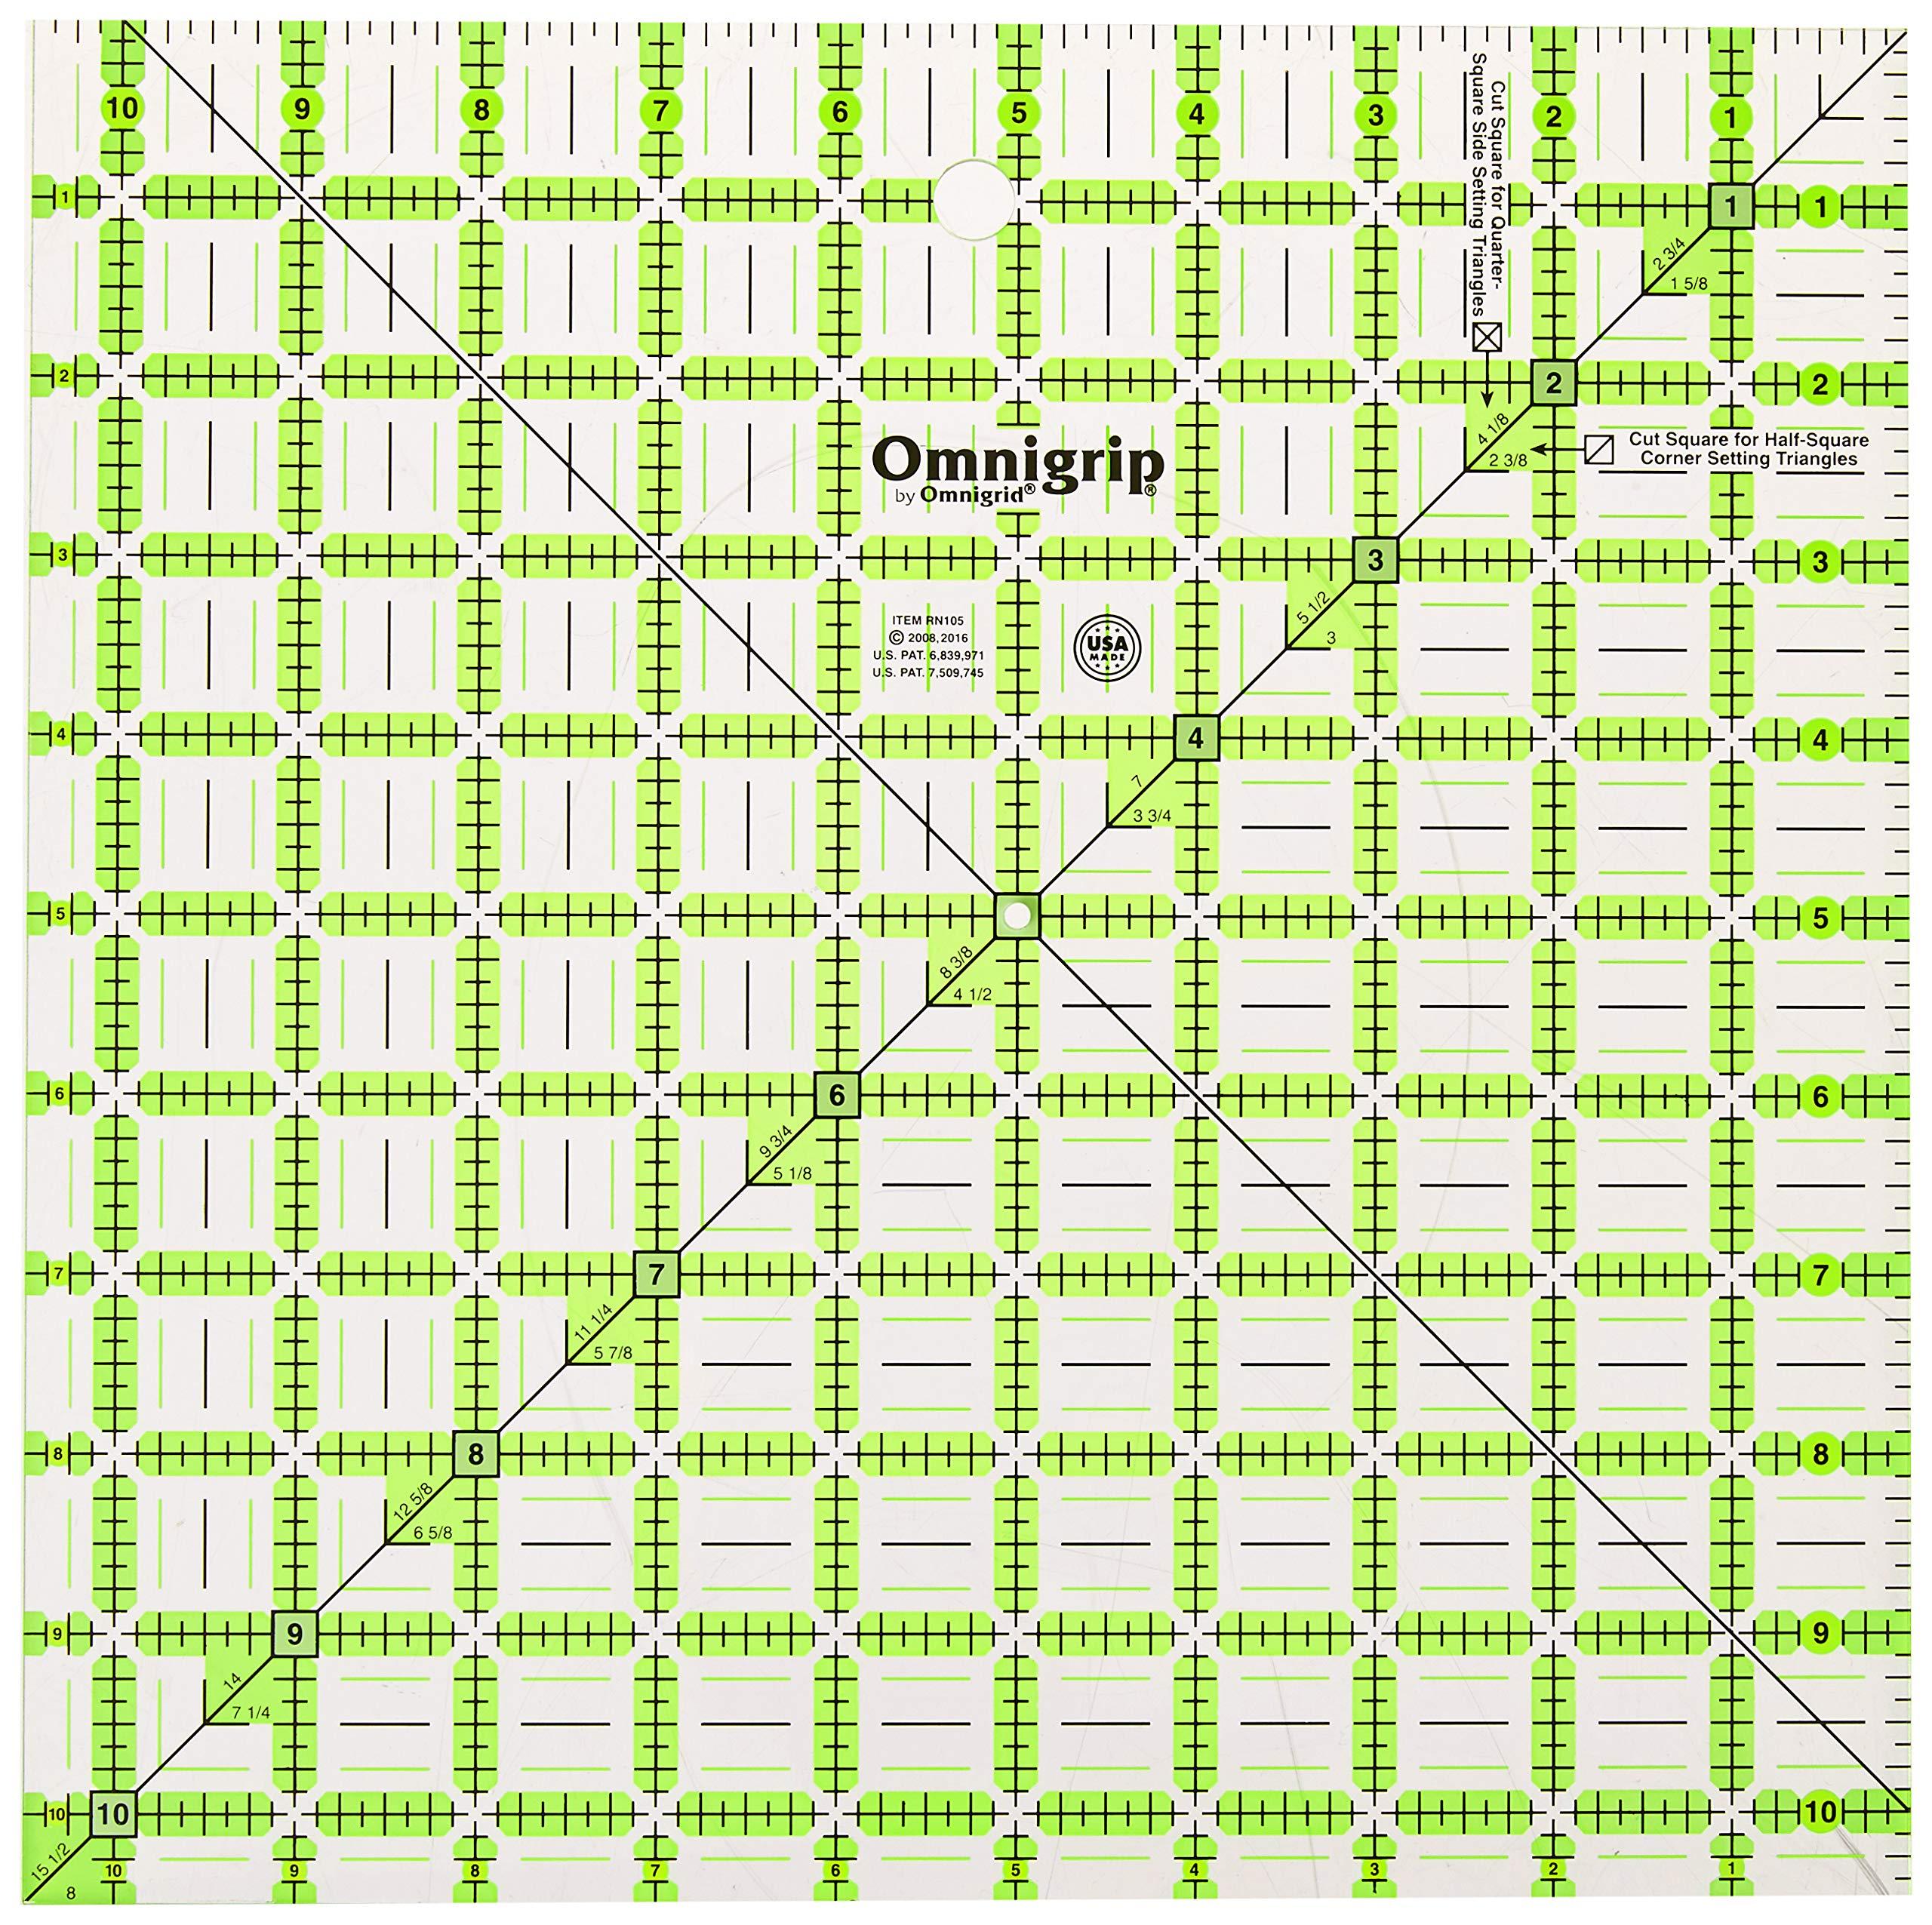 Omnigrip RN105 Non-Slip Quilter's Ruler, 10-1/2 x 10-1/2-Inch by Omnigrid